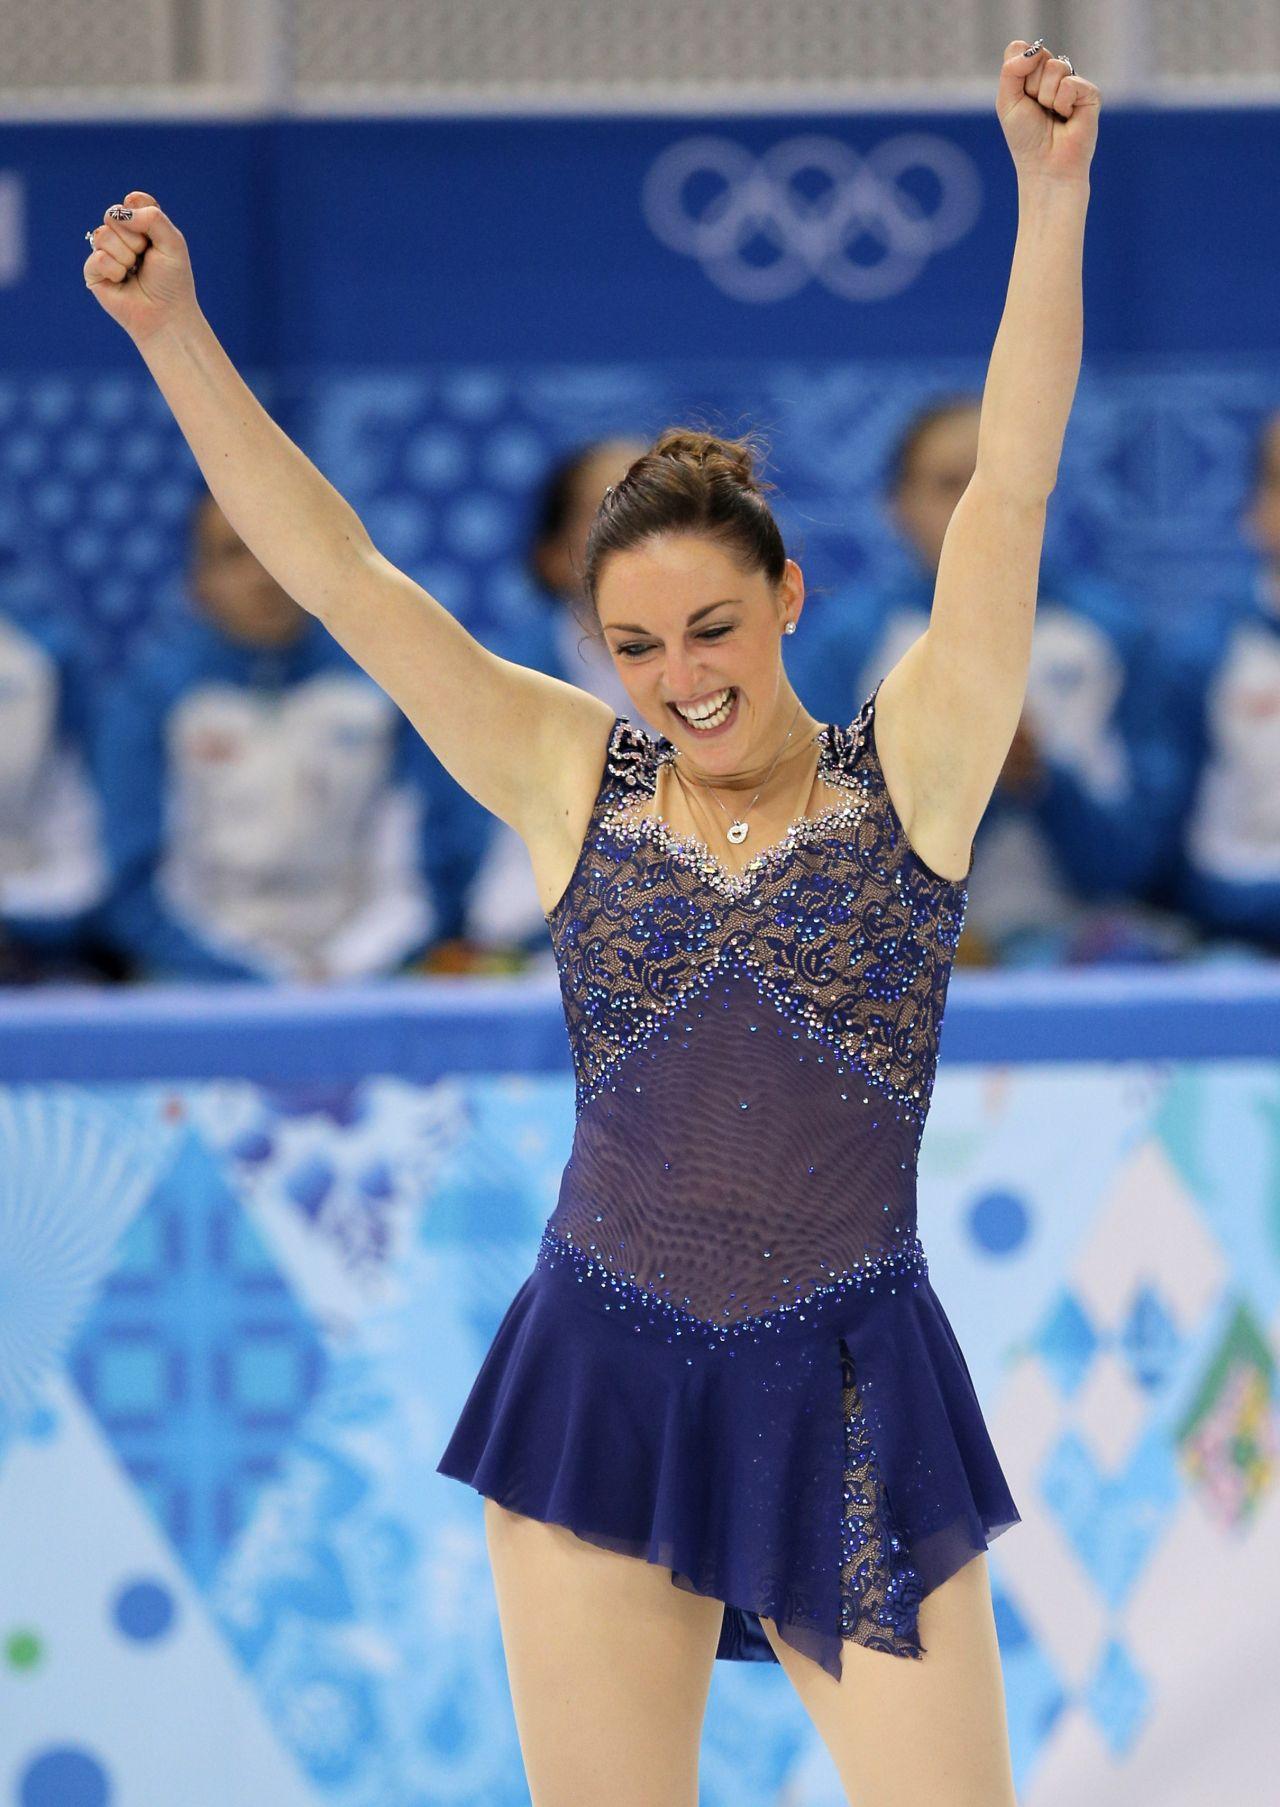 Jenna Mccorkell